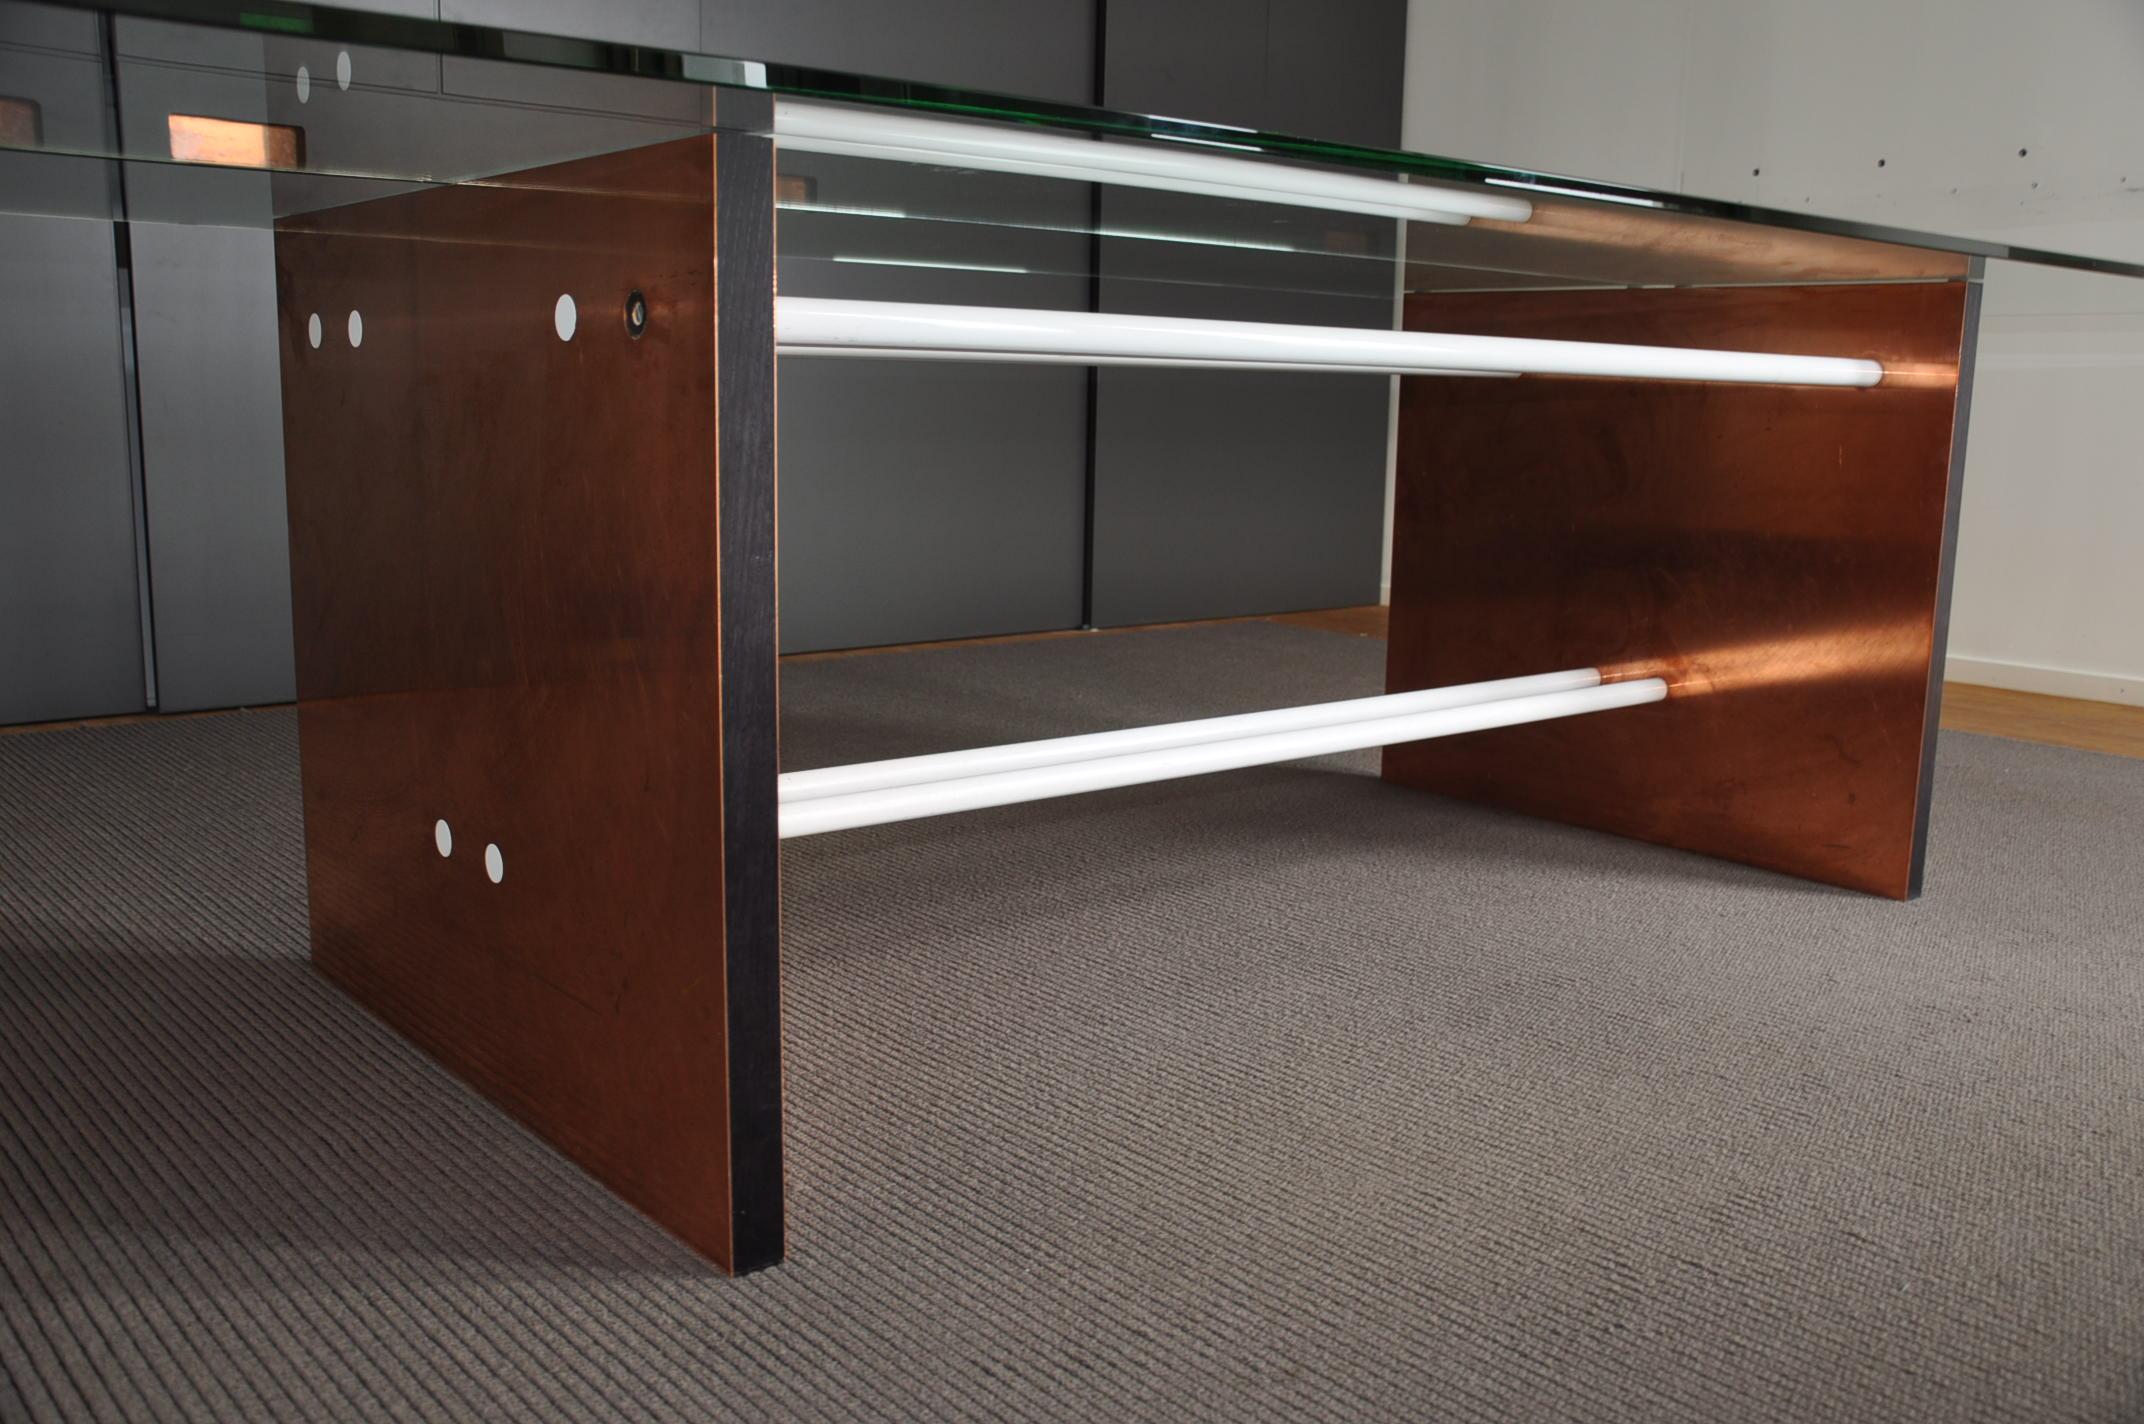 sideboard 300 cm beautiful stylform selene cm solid oak and glass bifold doors optional drawers. Black Bedroom Furniture Sets. Home Design Ideas